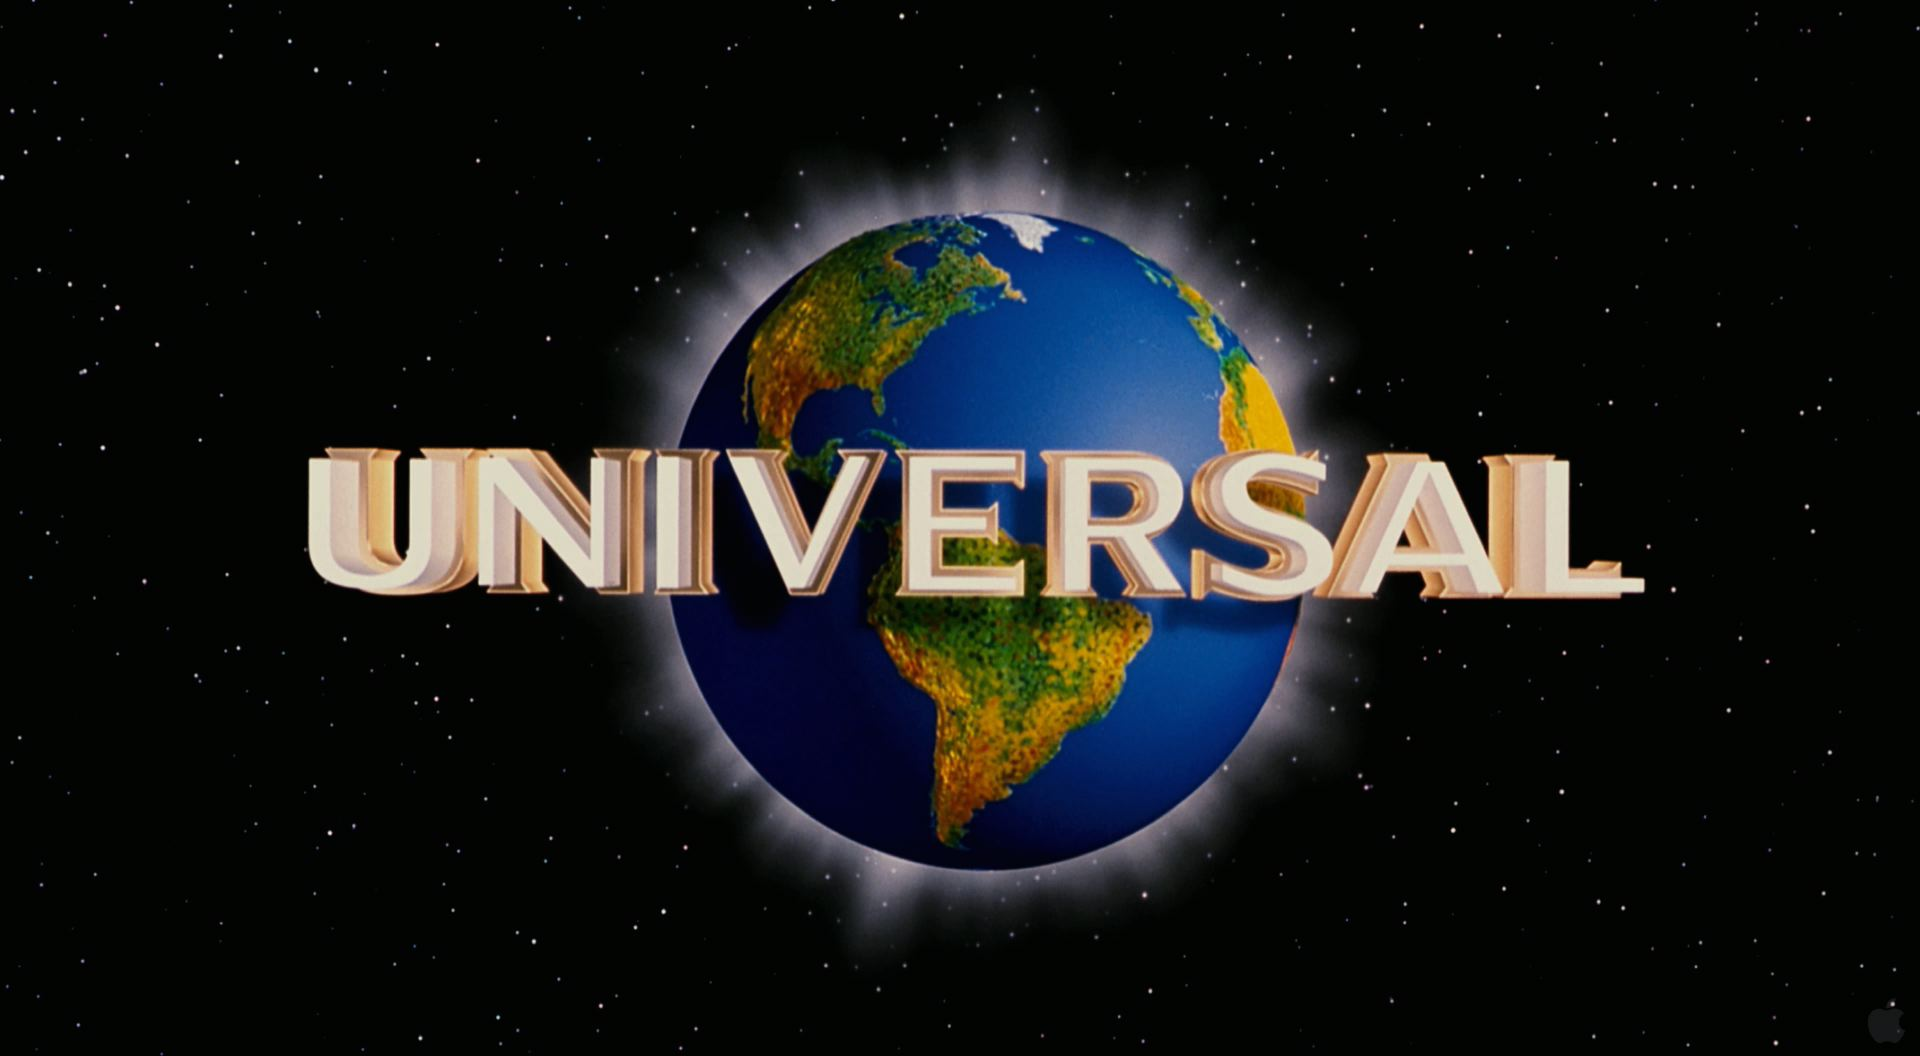 Universal Studios Logo Desktop Wallpaper 1920x1056